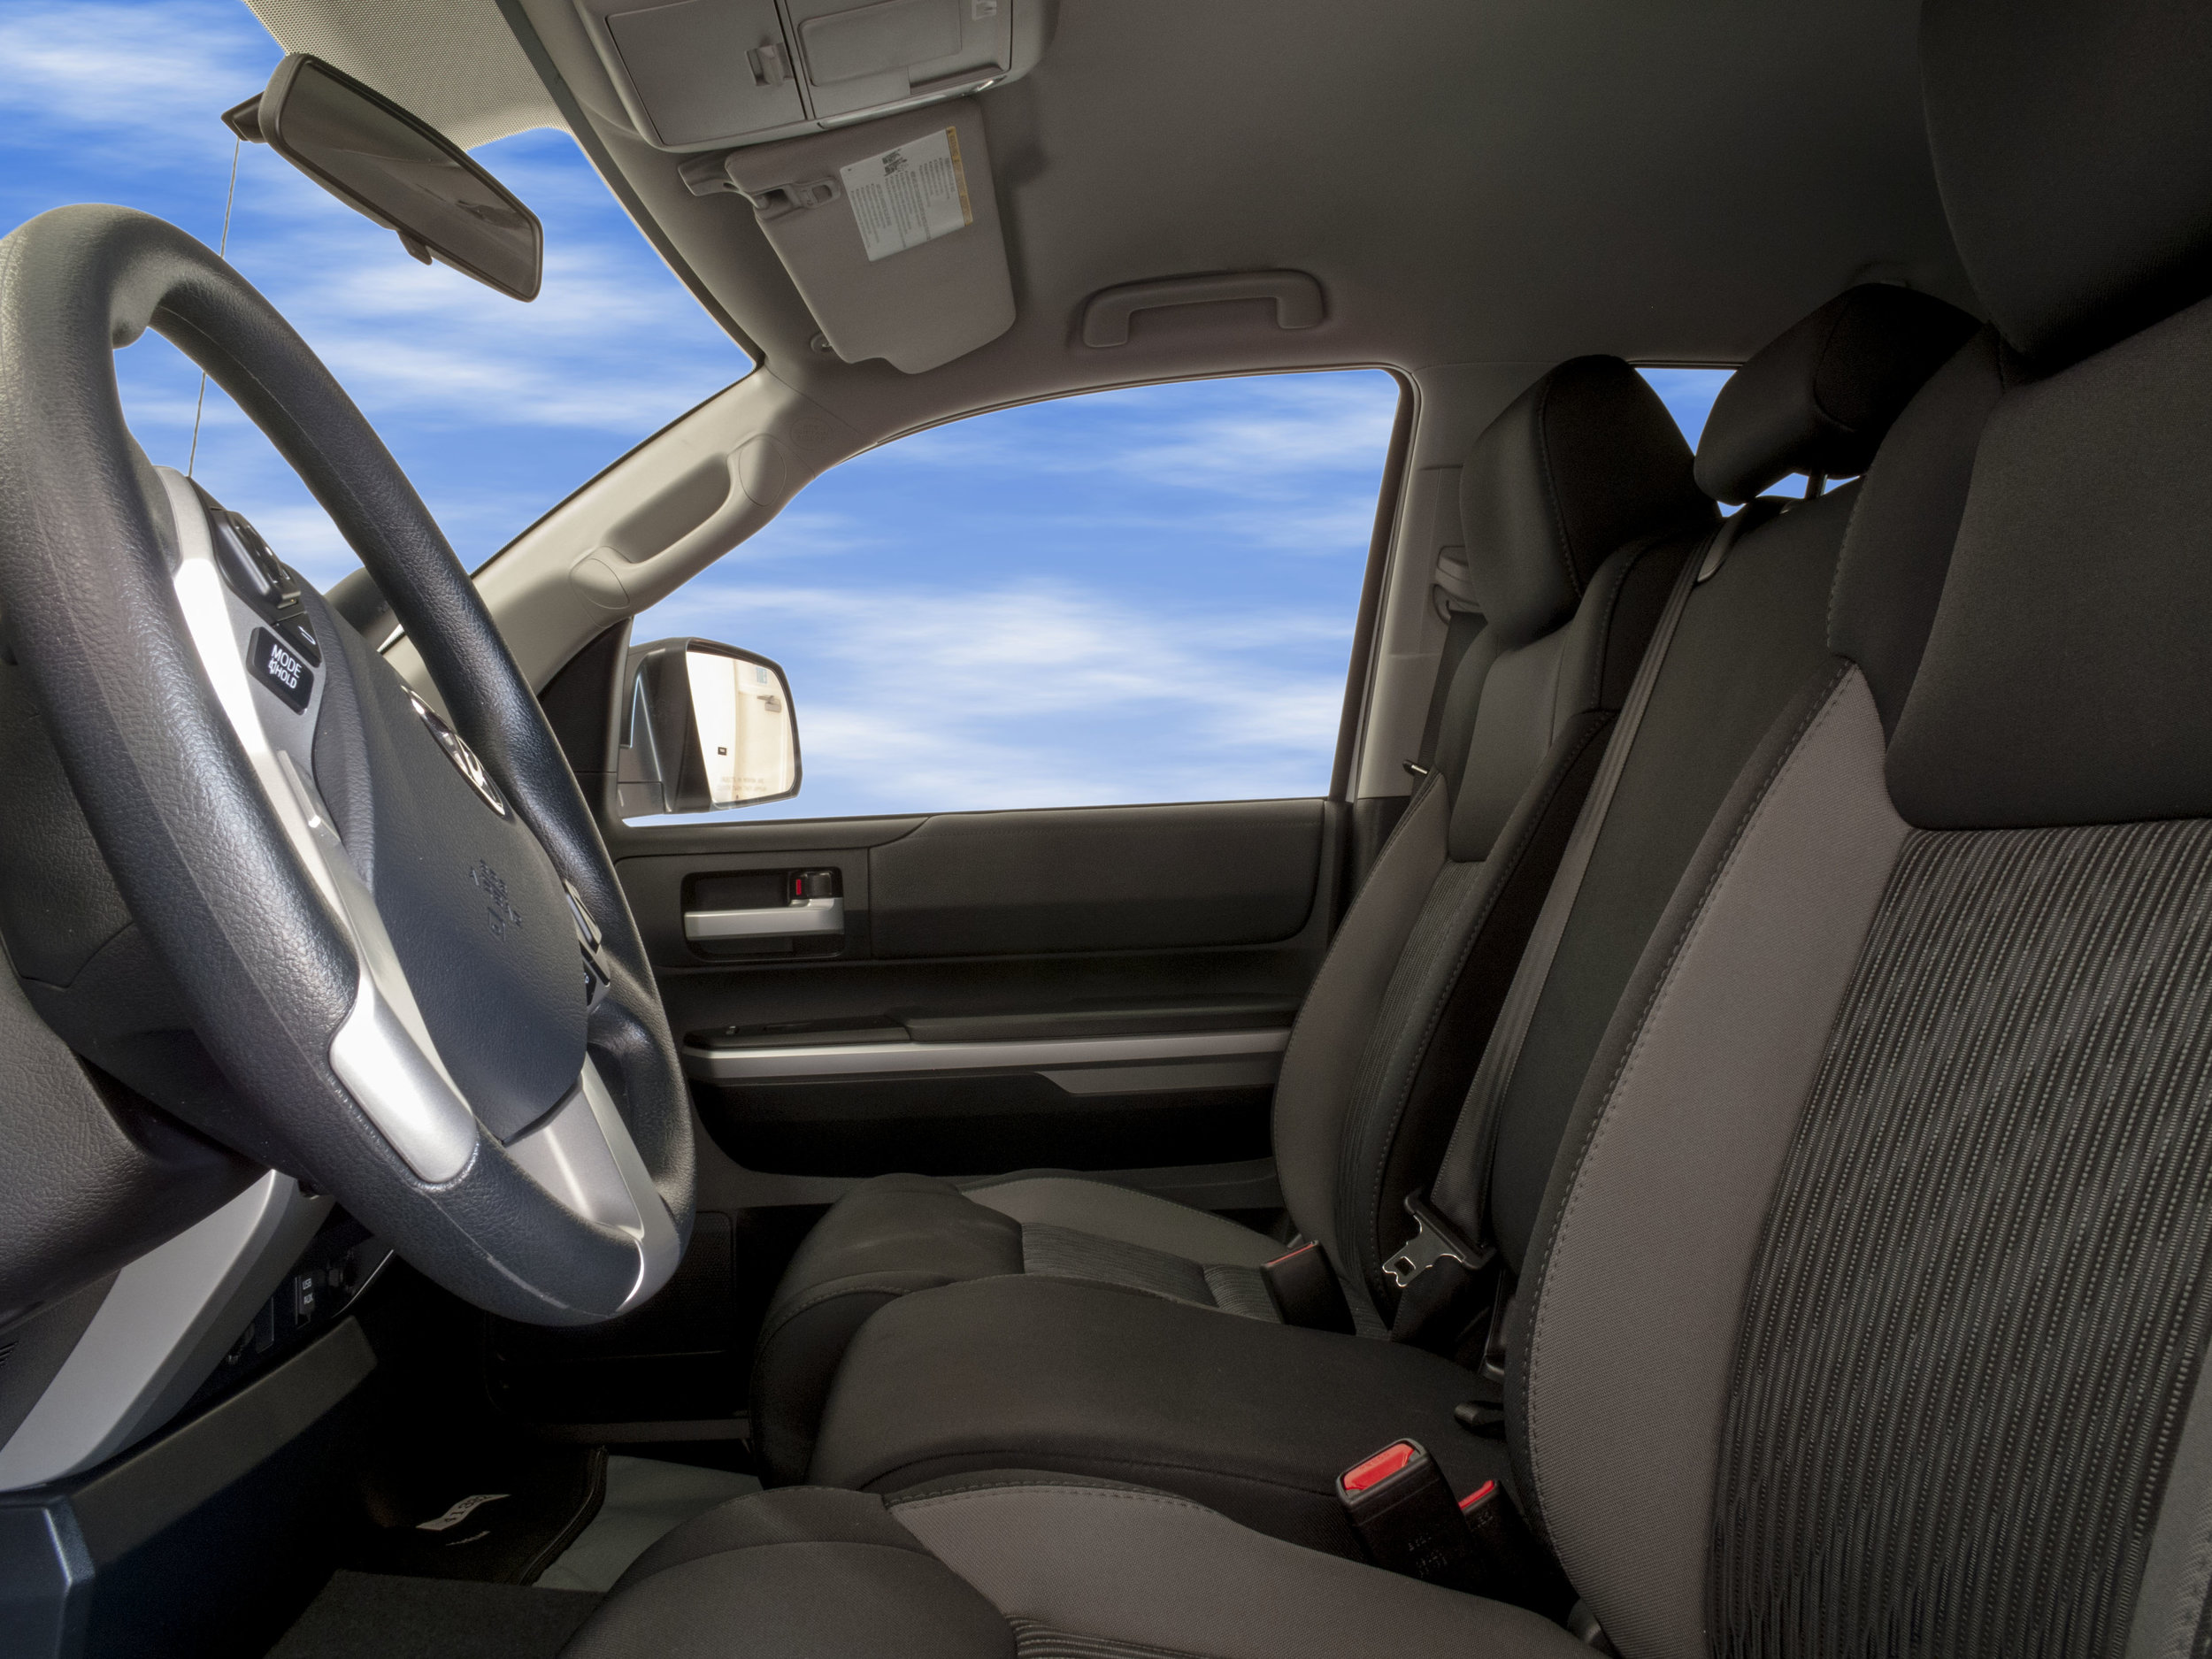 Toyota Tundra Interior Front (Bench).jpg